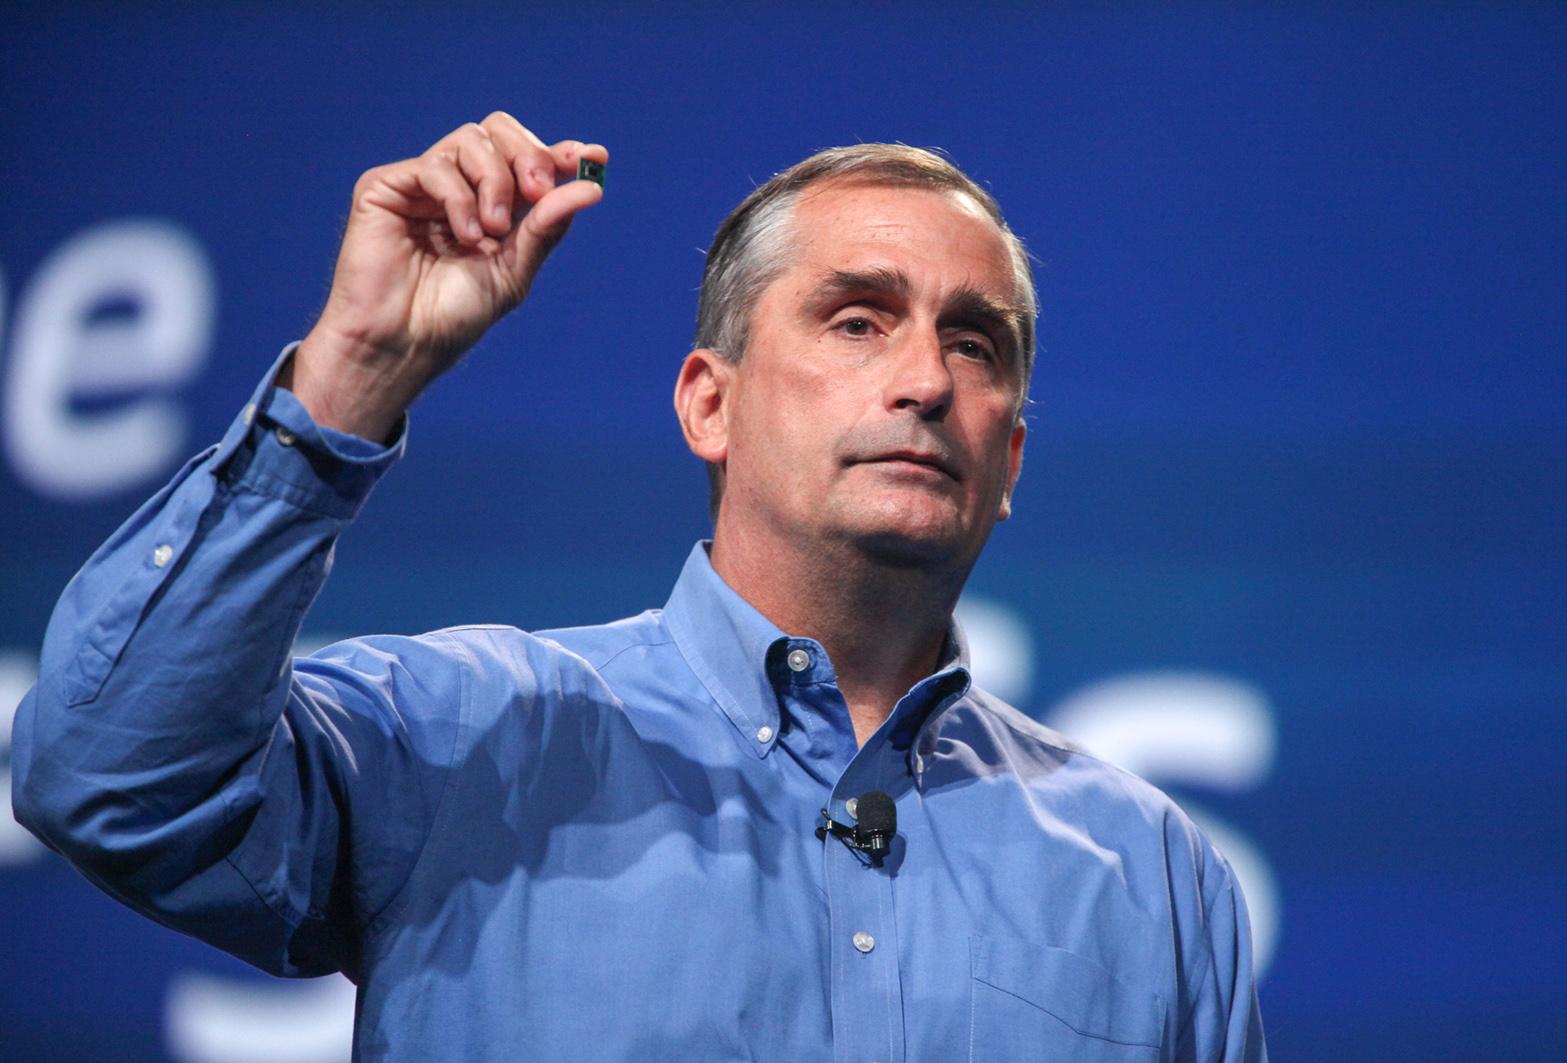 fdca20c4662fa Intel CEO Brian Krzanich Resigns